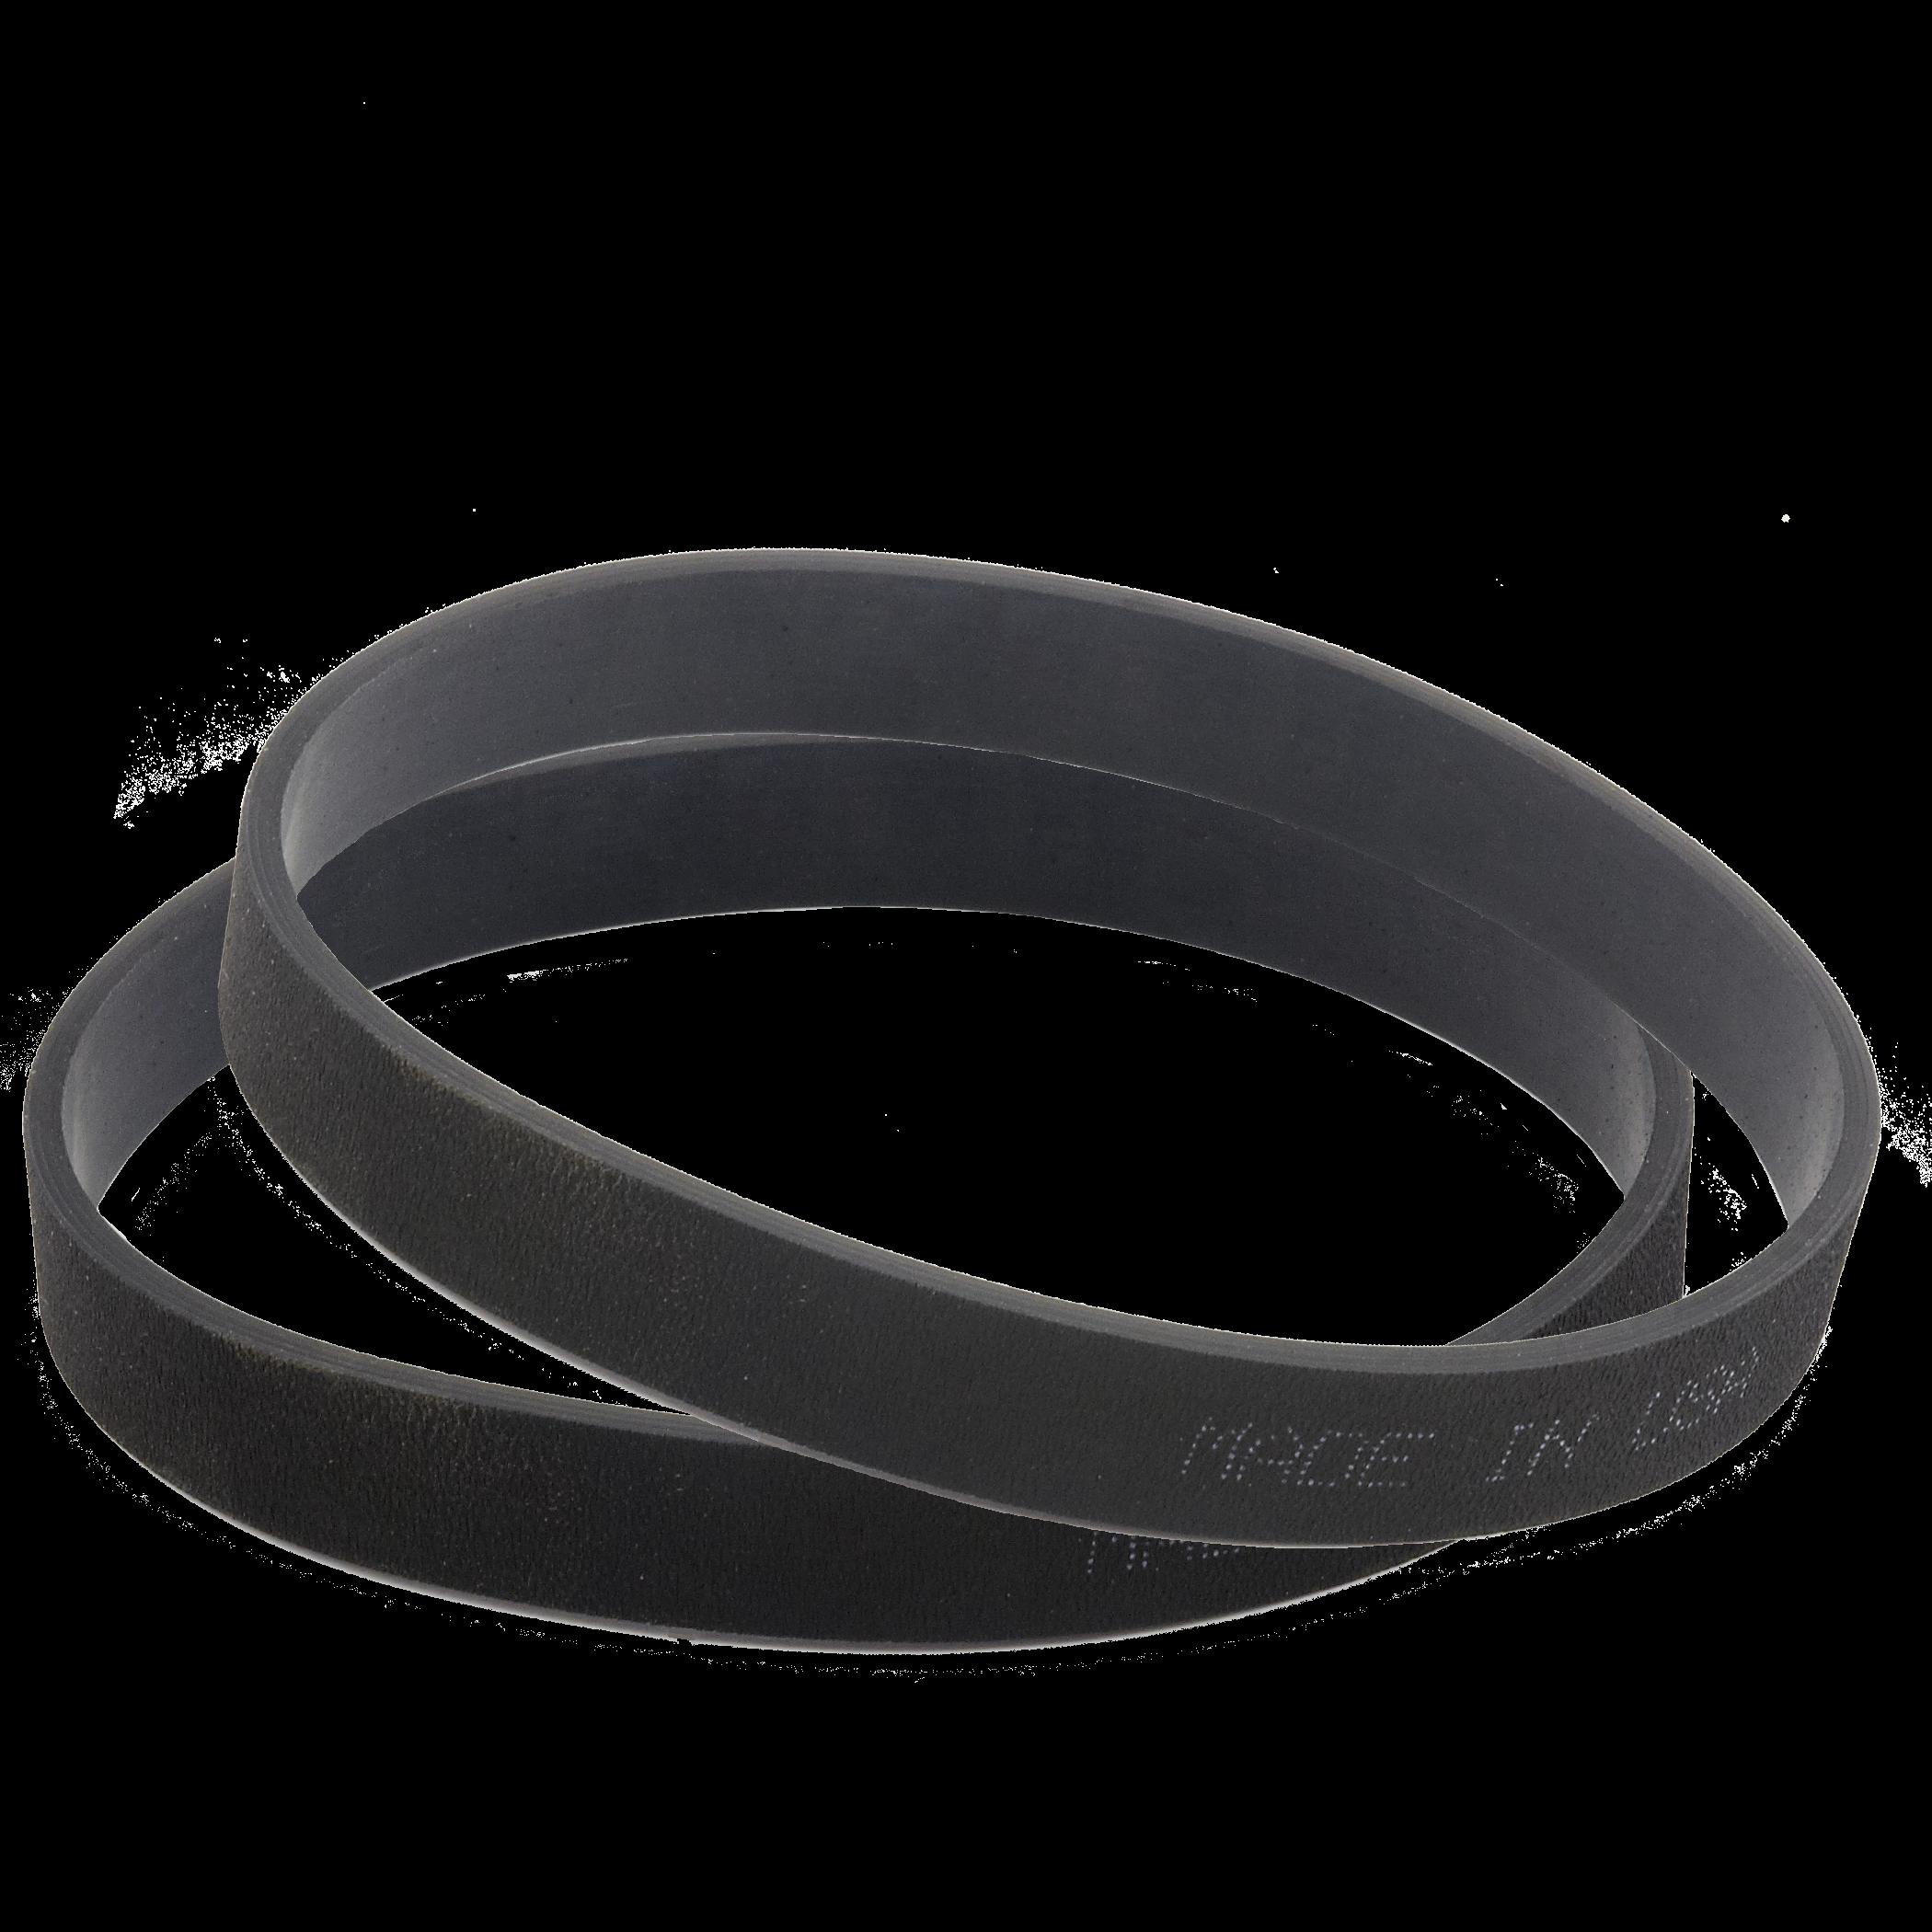 Simplicity/Riccar freedom/ULW/Supralite belts 2pk